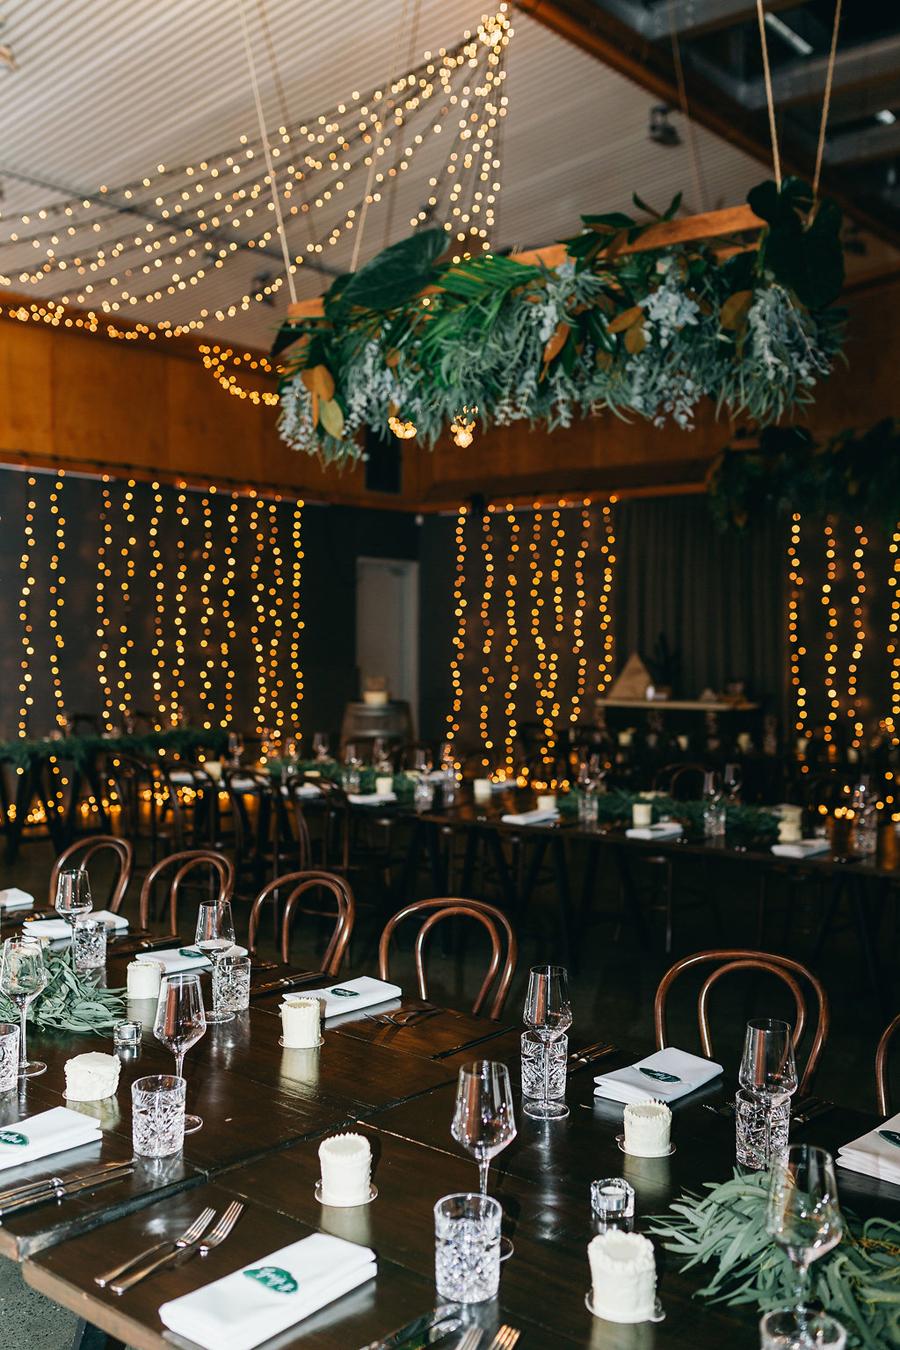 tweed-coast-weddings-wedding-venue-osteria-casuarina-garden-real-wedding-brittney-justin003.jpg